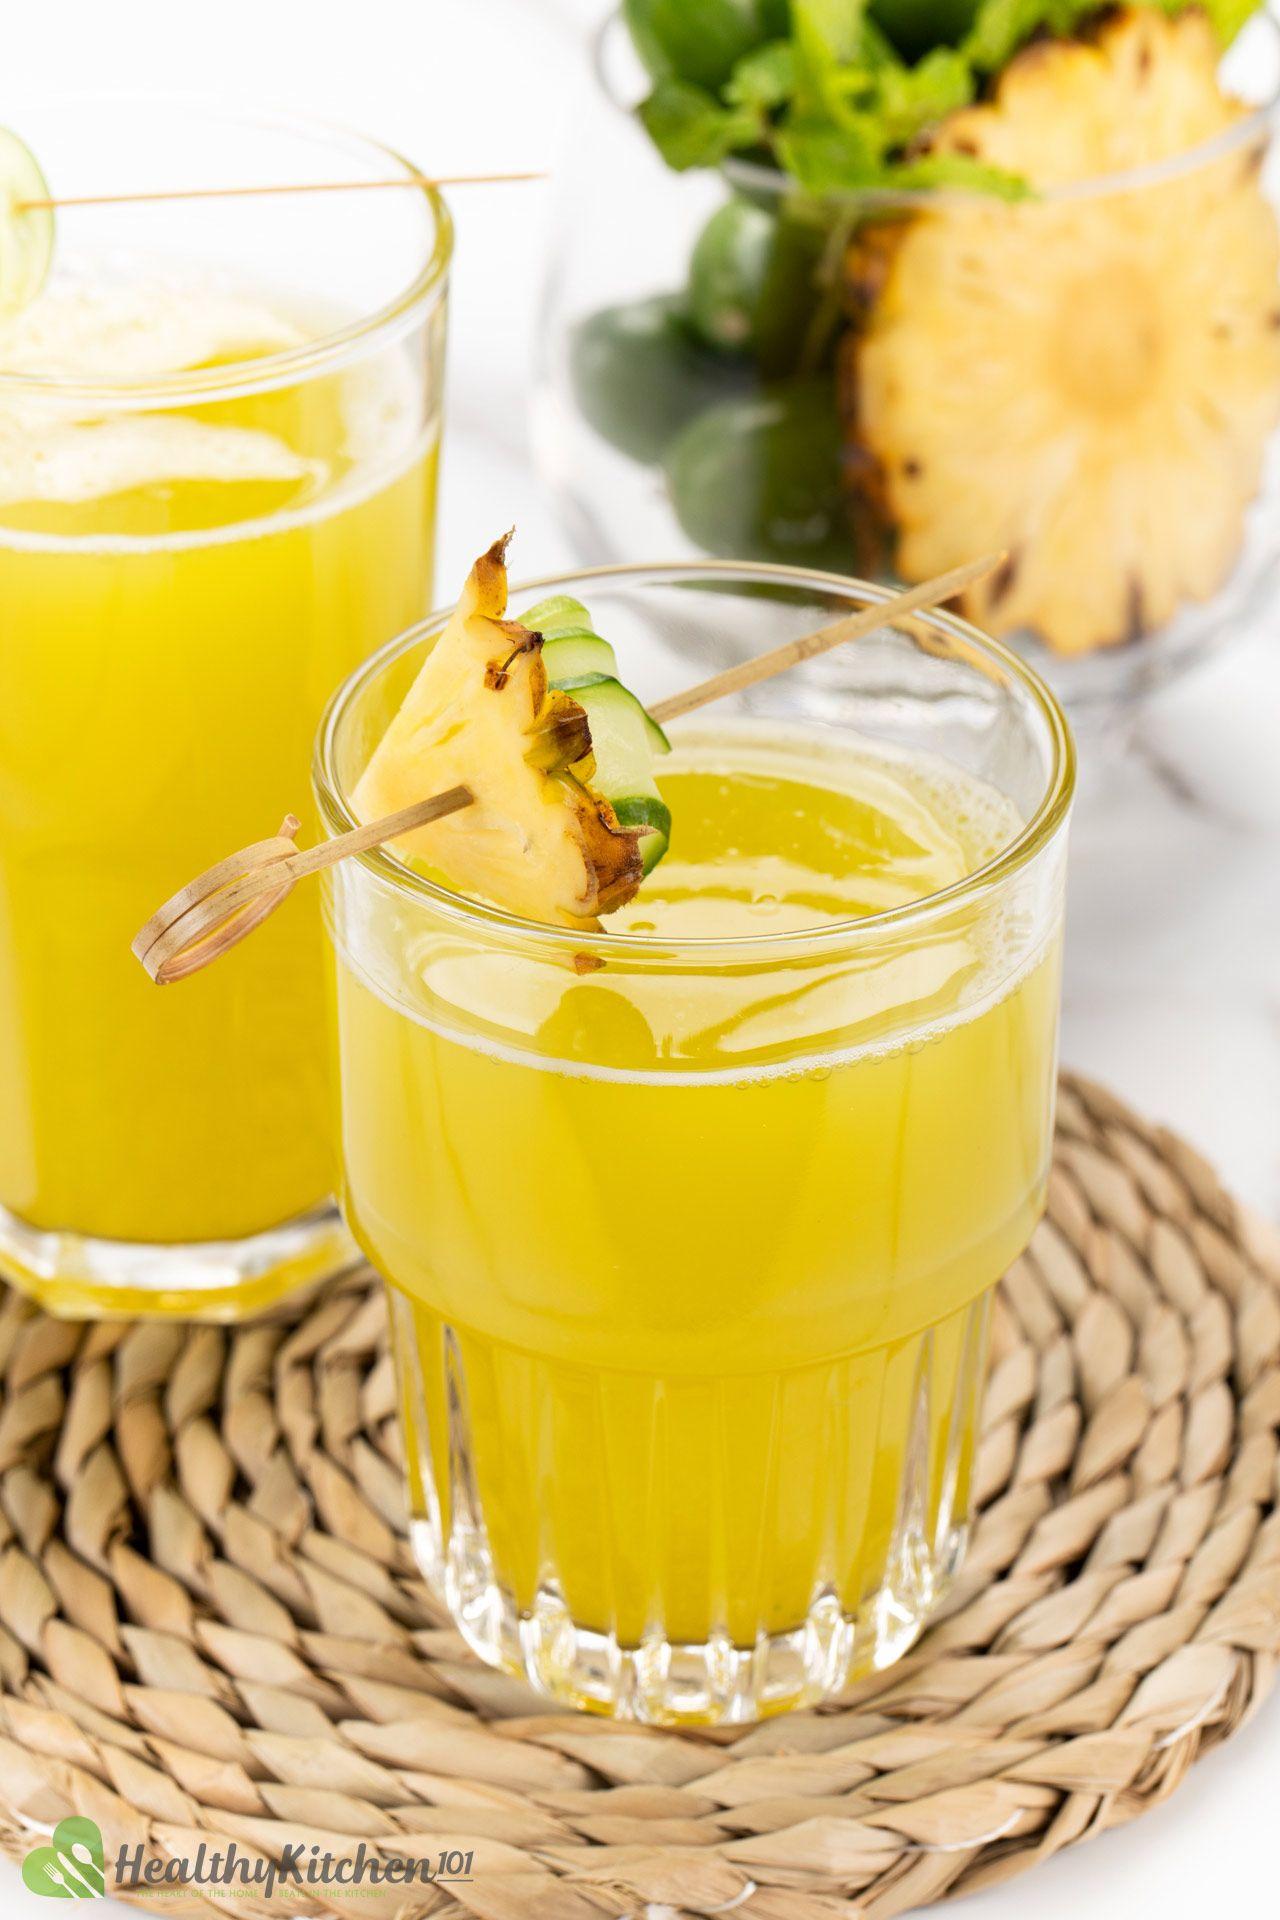 Homemade Pineapple Cucumber Juice